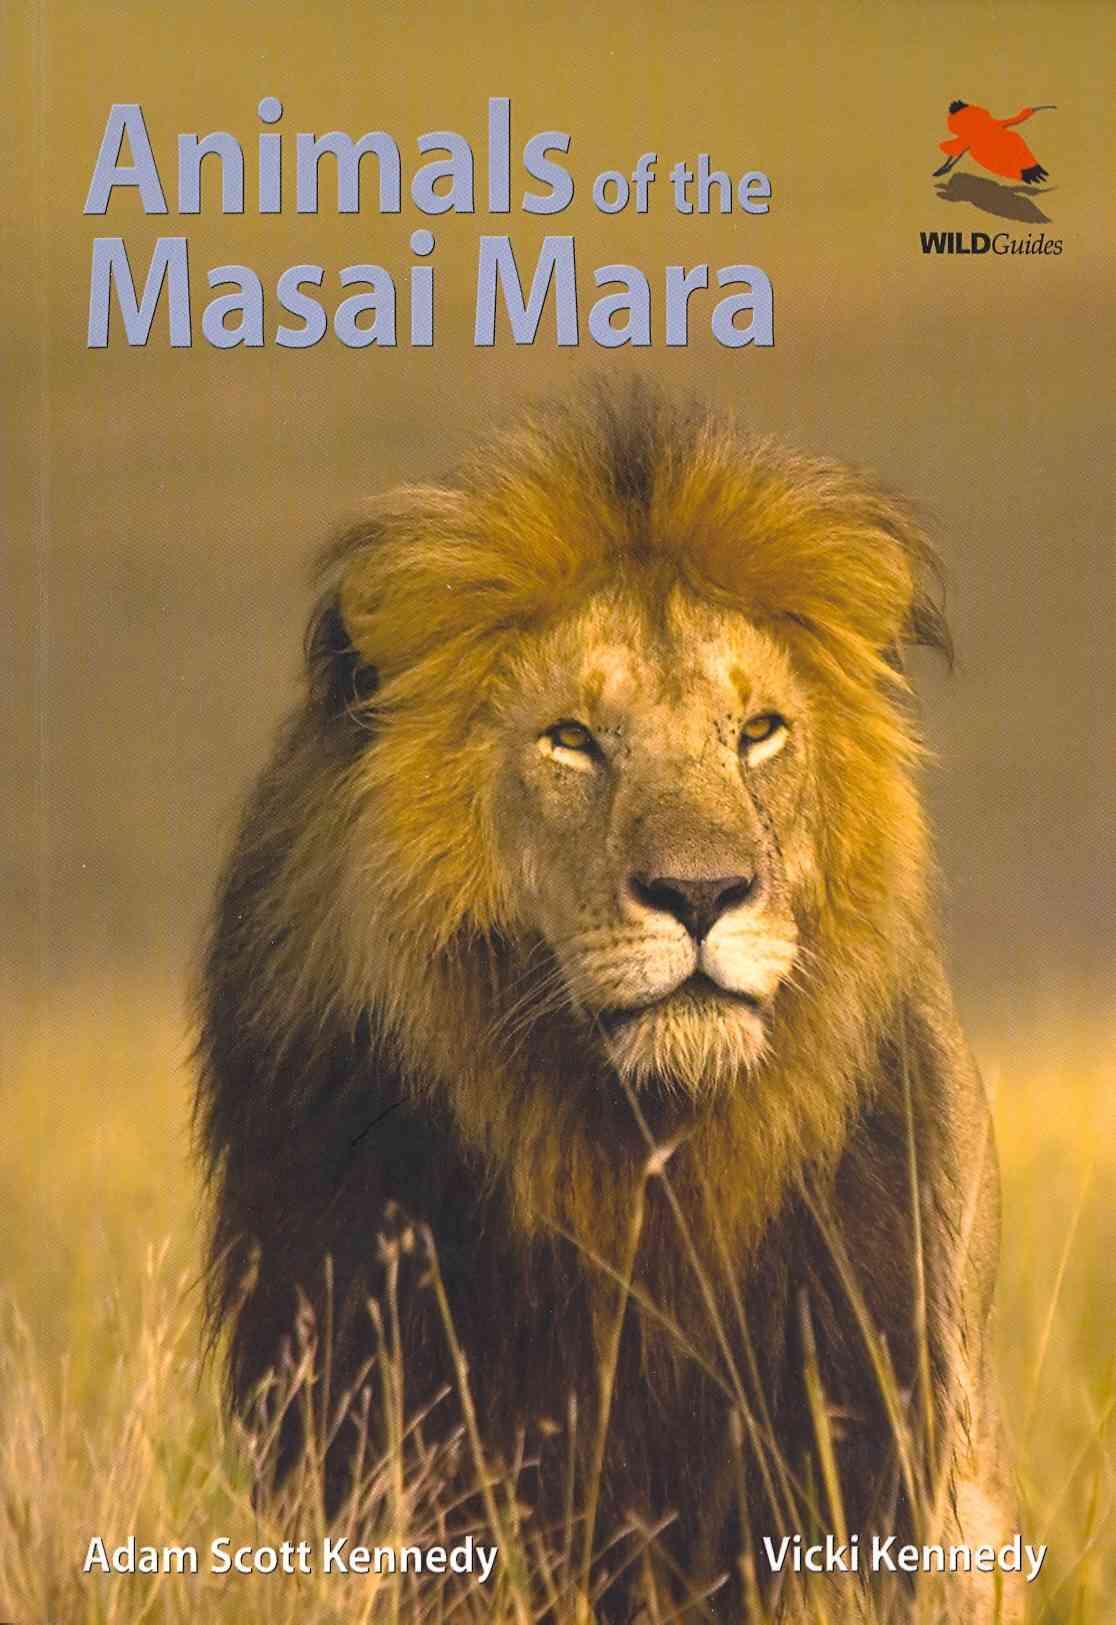 Animals of the Masai Mara By Kennedy, Adam Scott/ Kennedy, Vicki